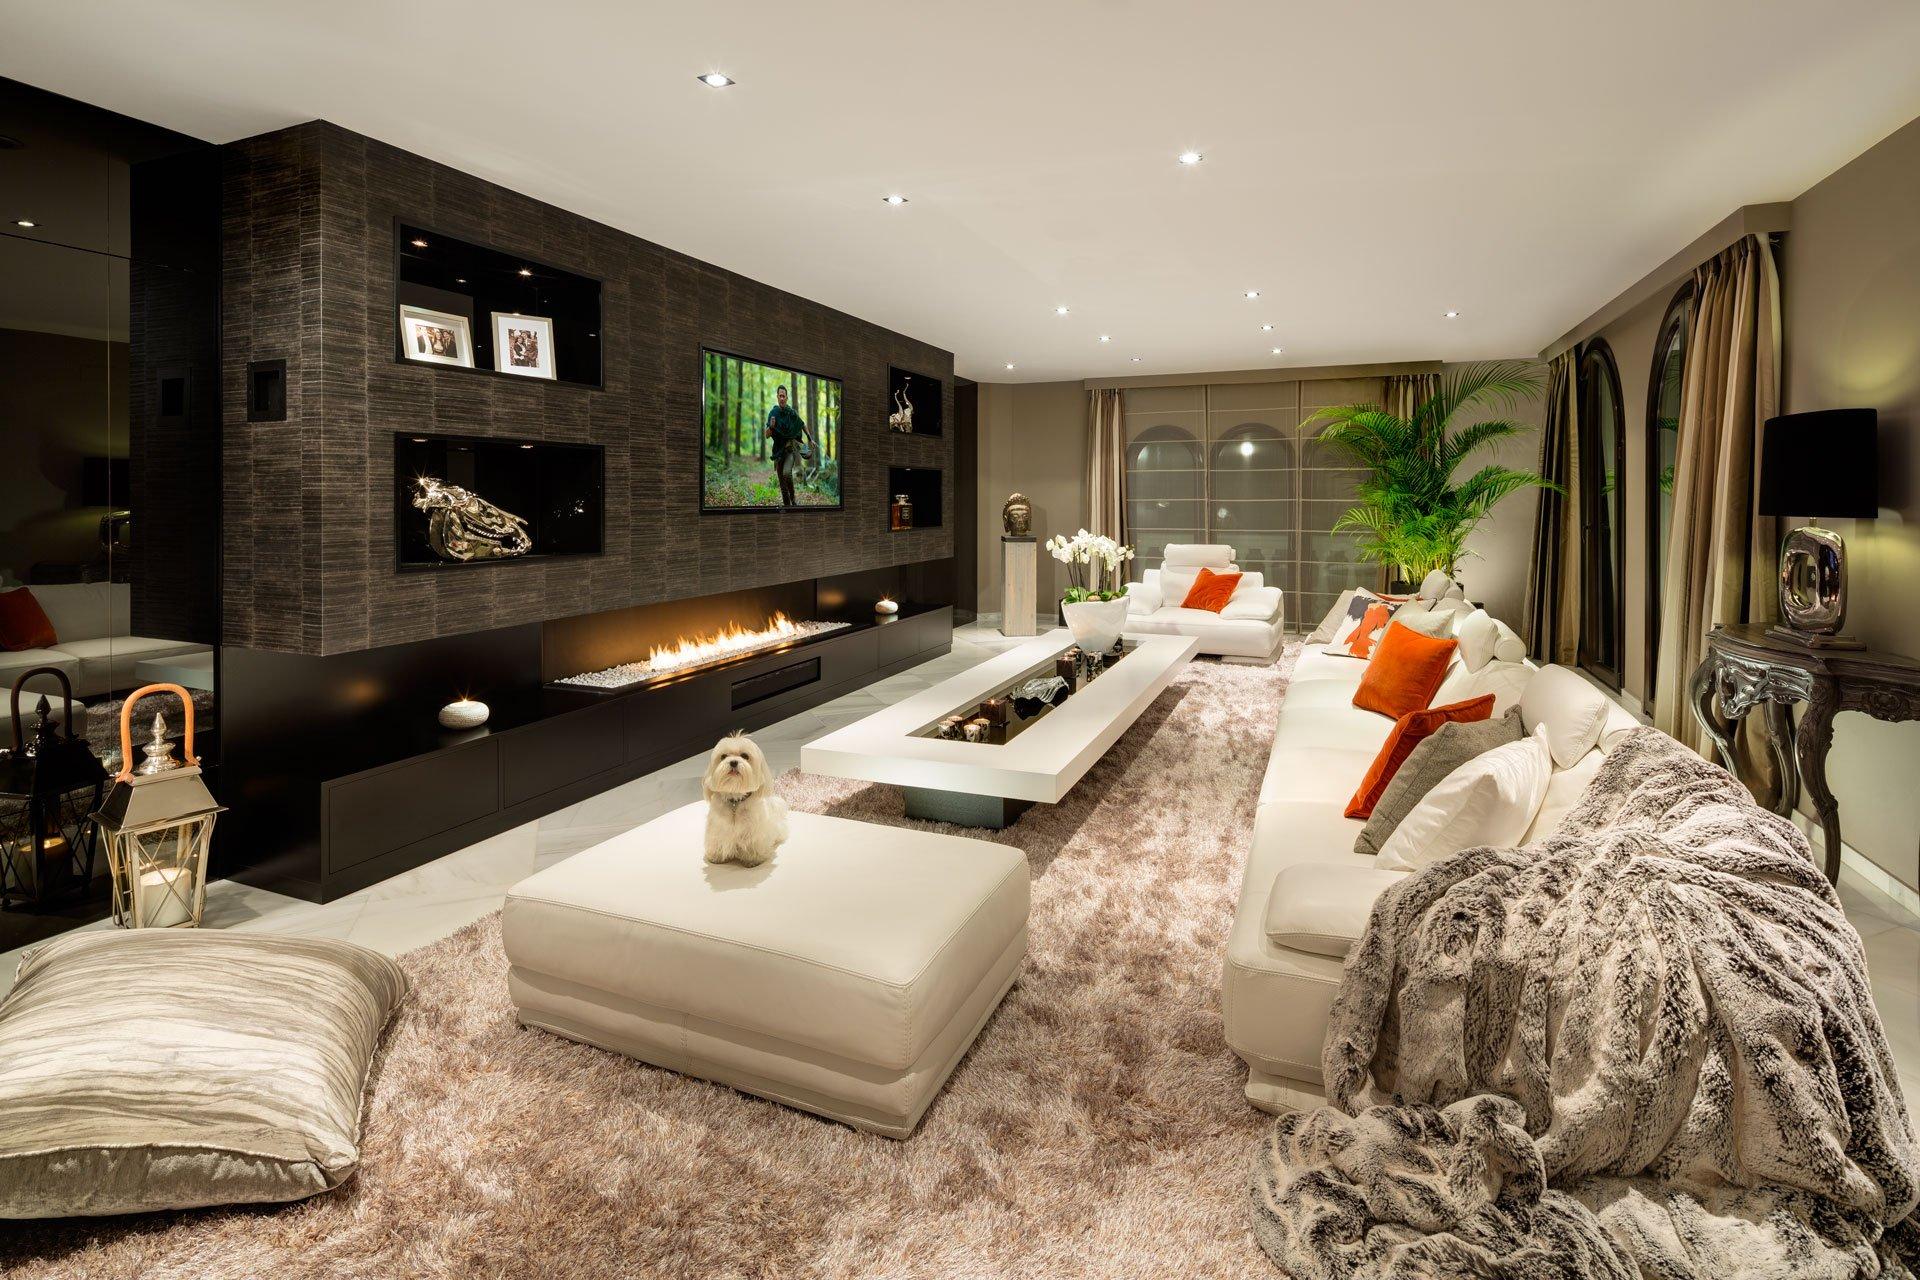 villa-marbella-living-room-ambience-home-design-01